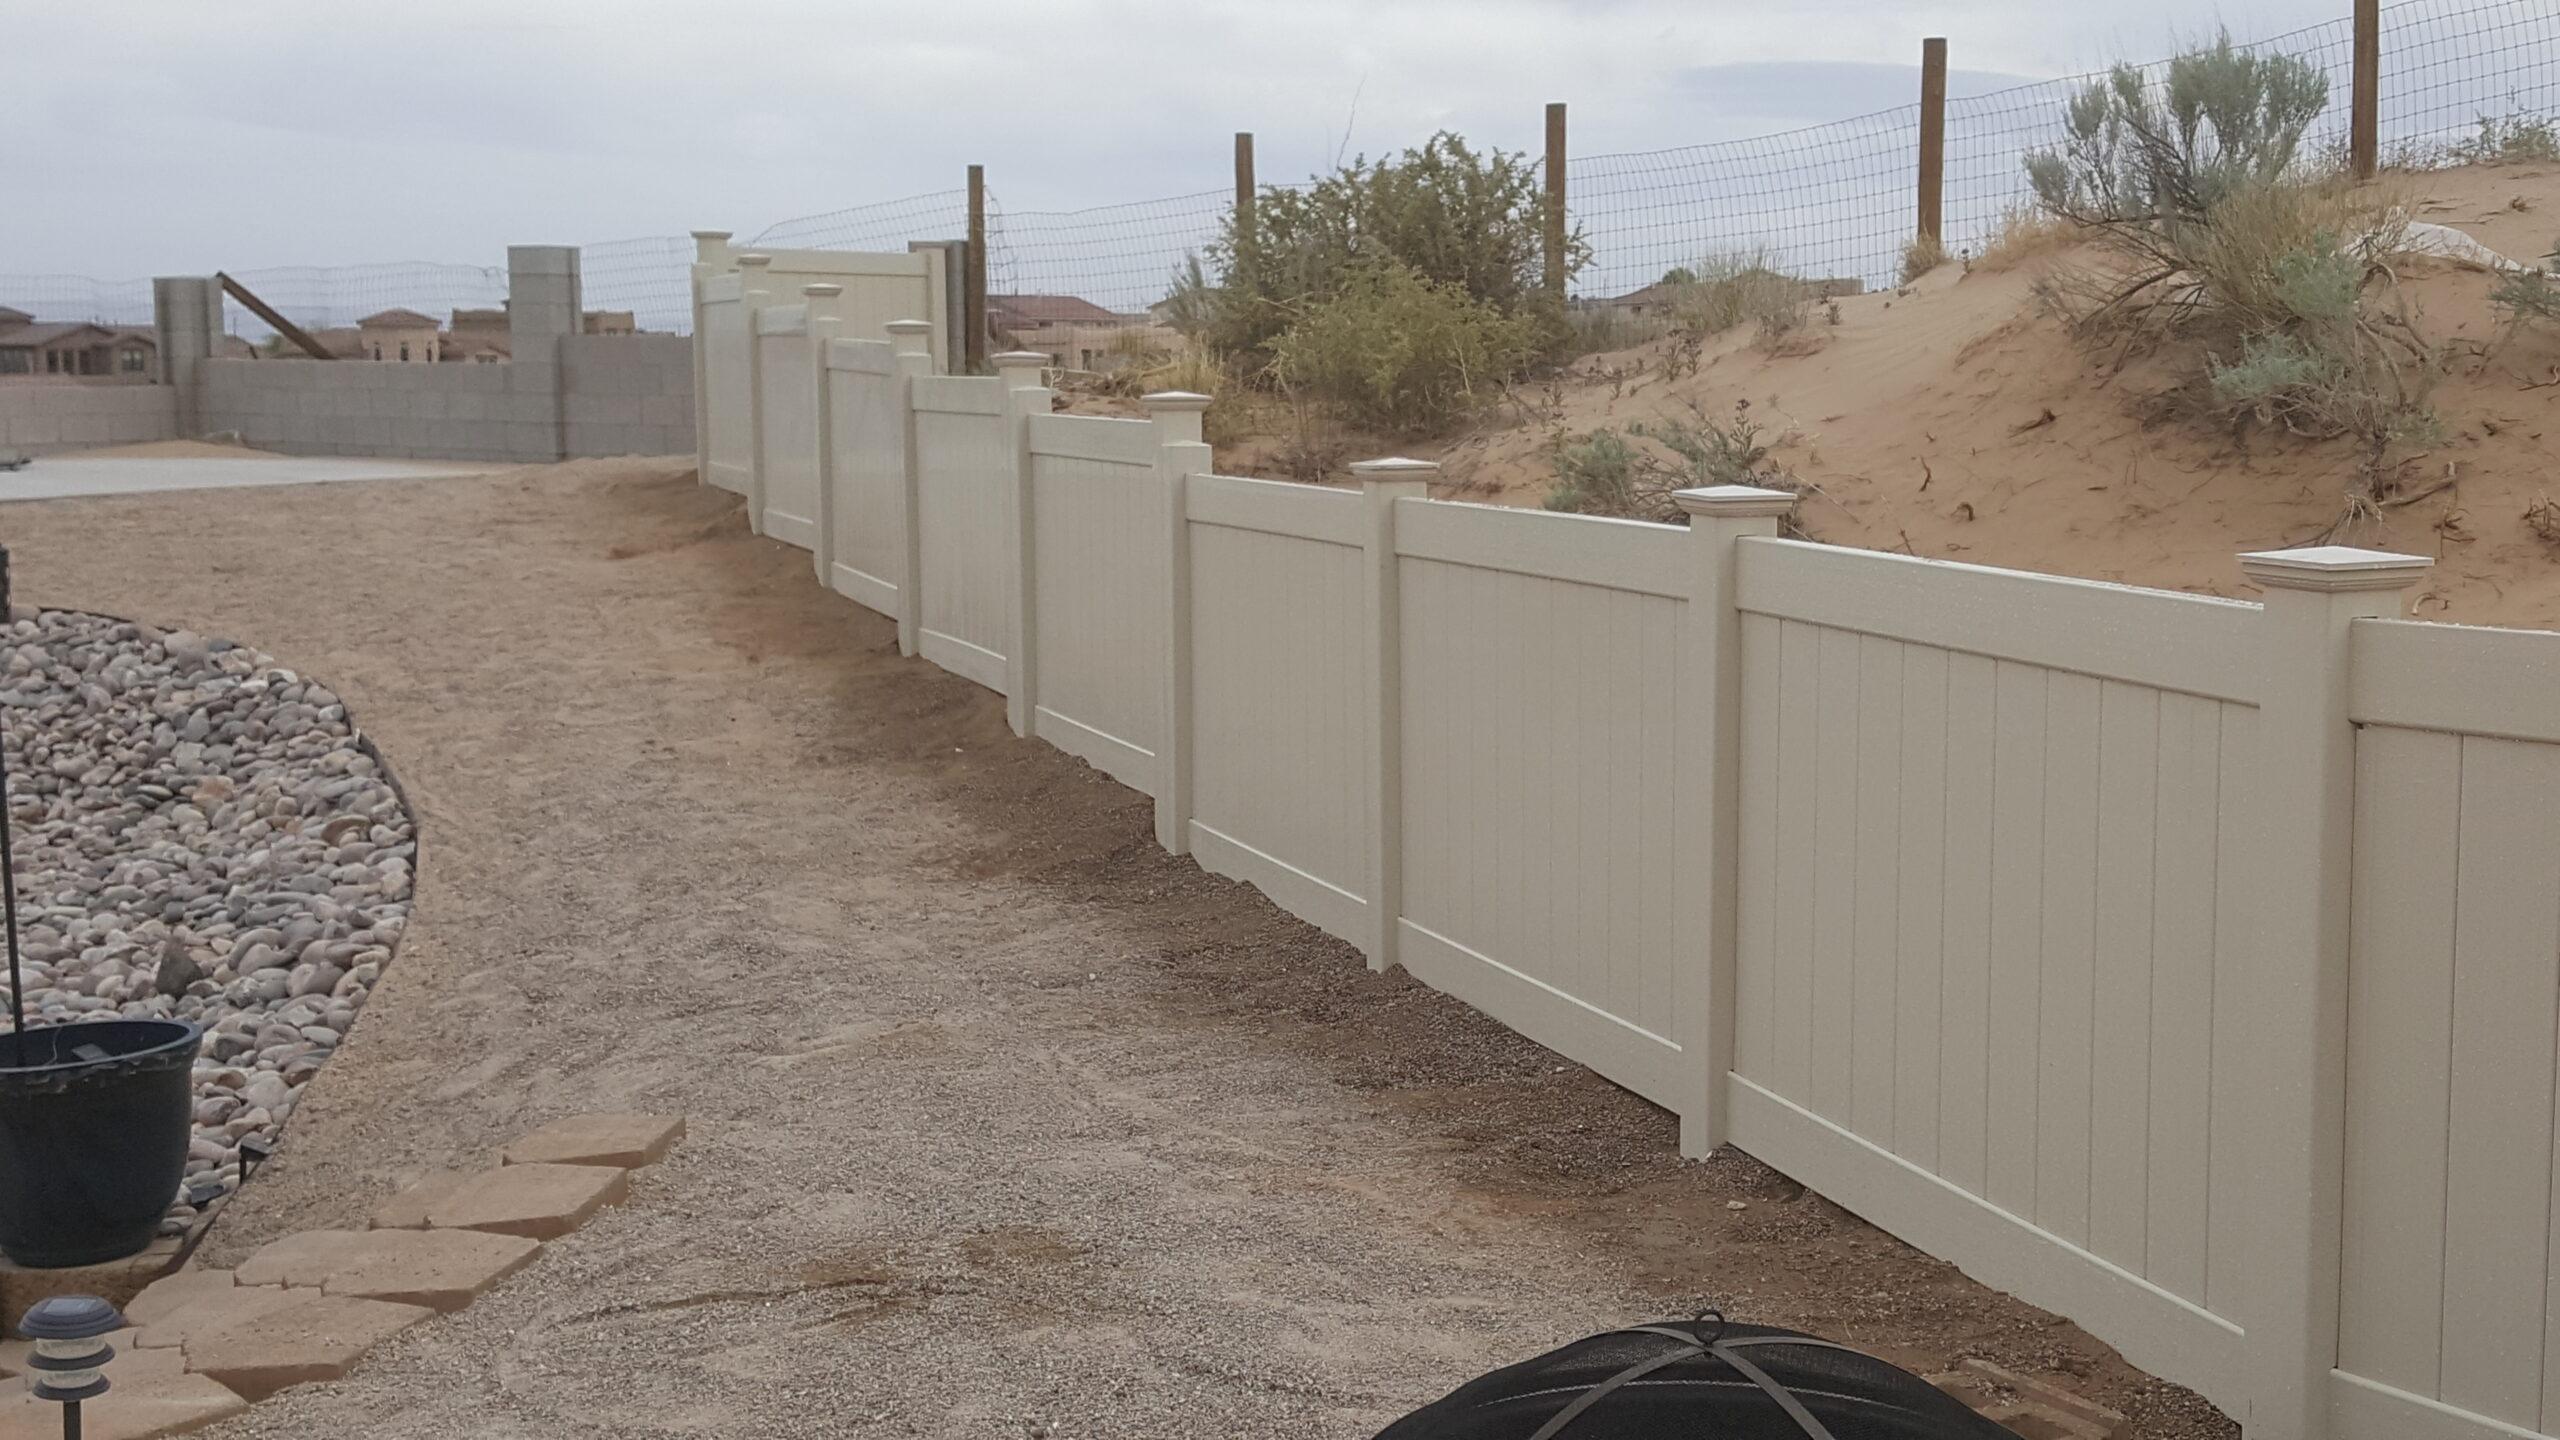 image showing vinyl fence